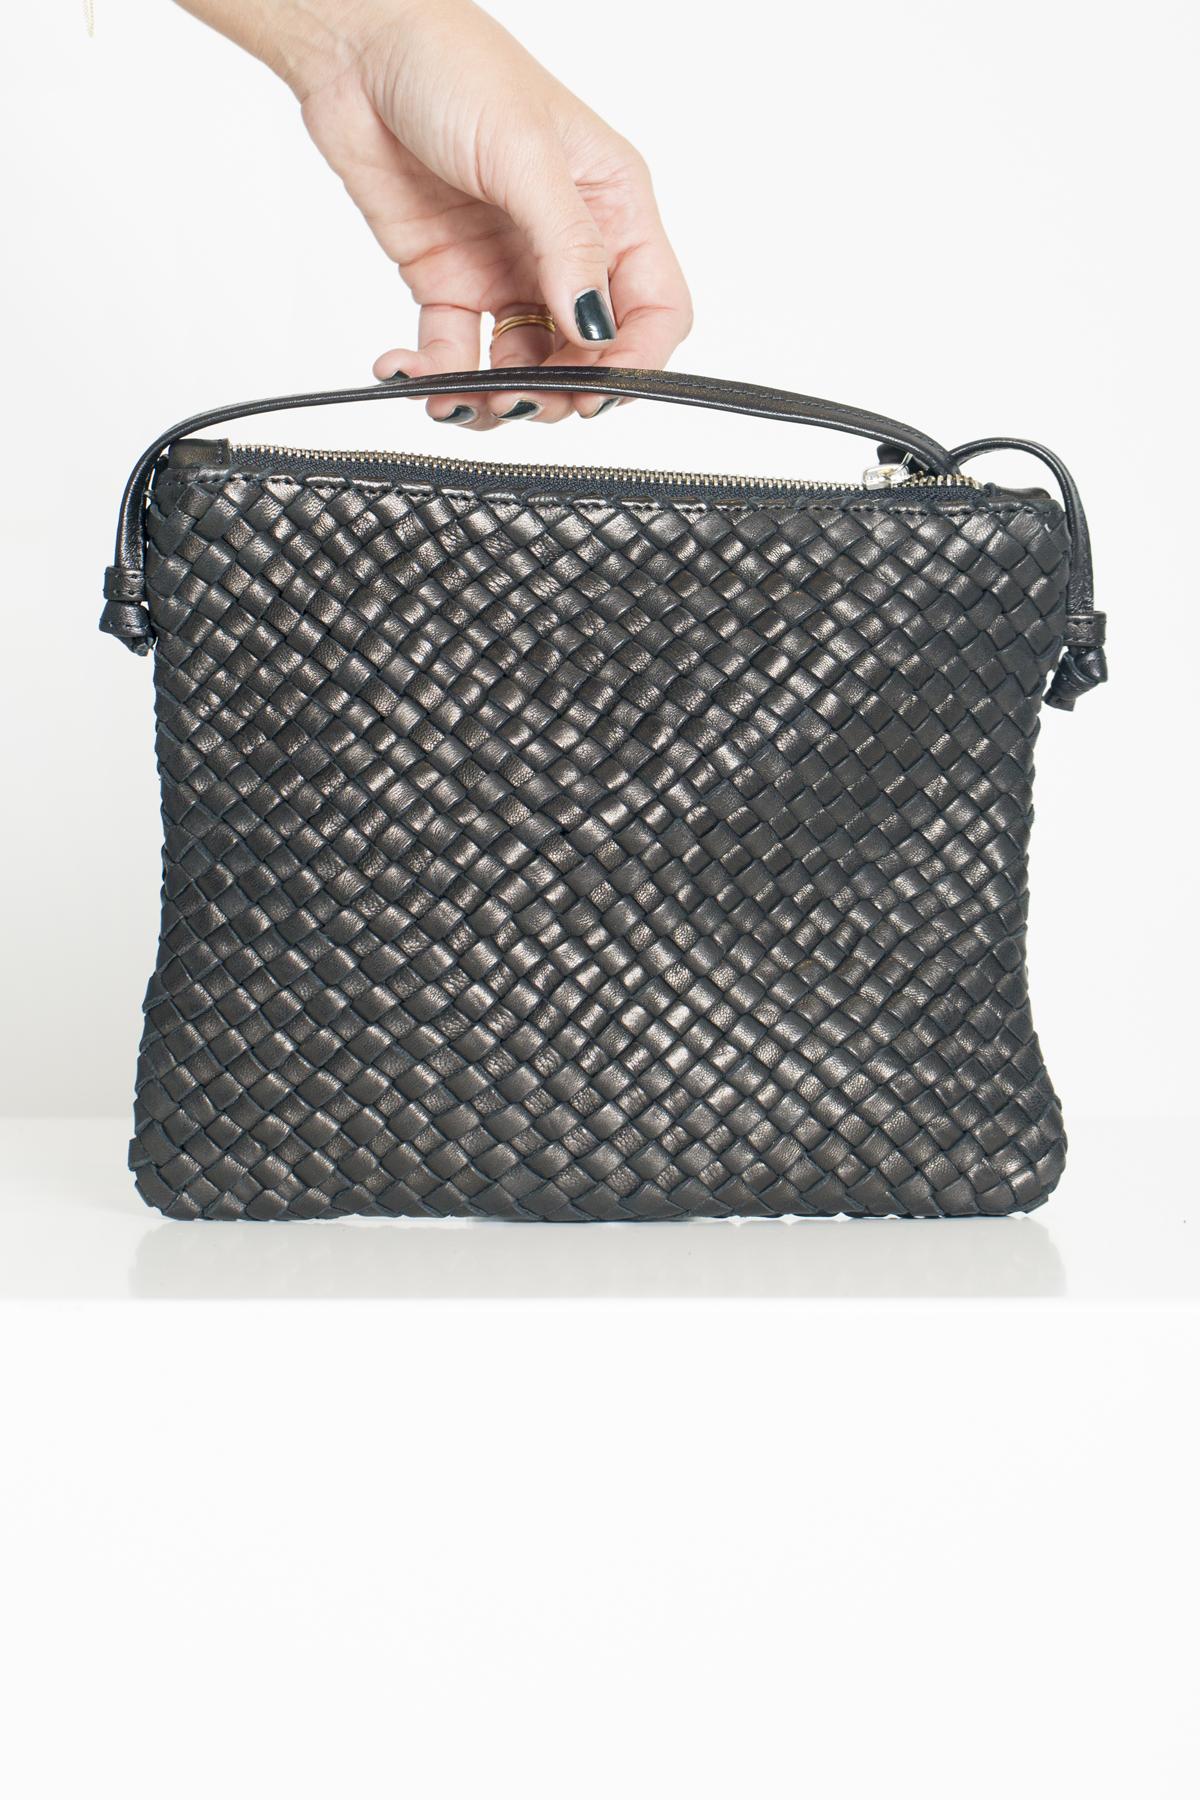 clutch-purse-bag-black-claramonte-leather-matchboxathens